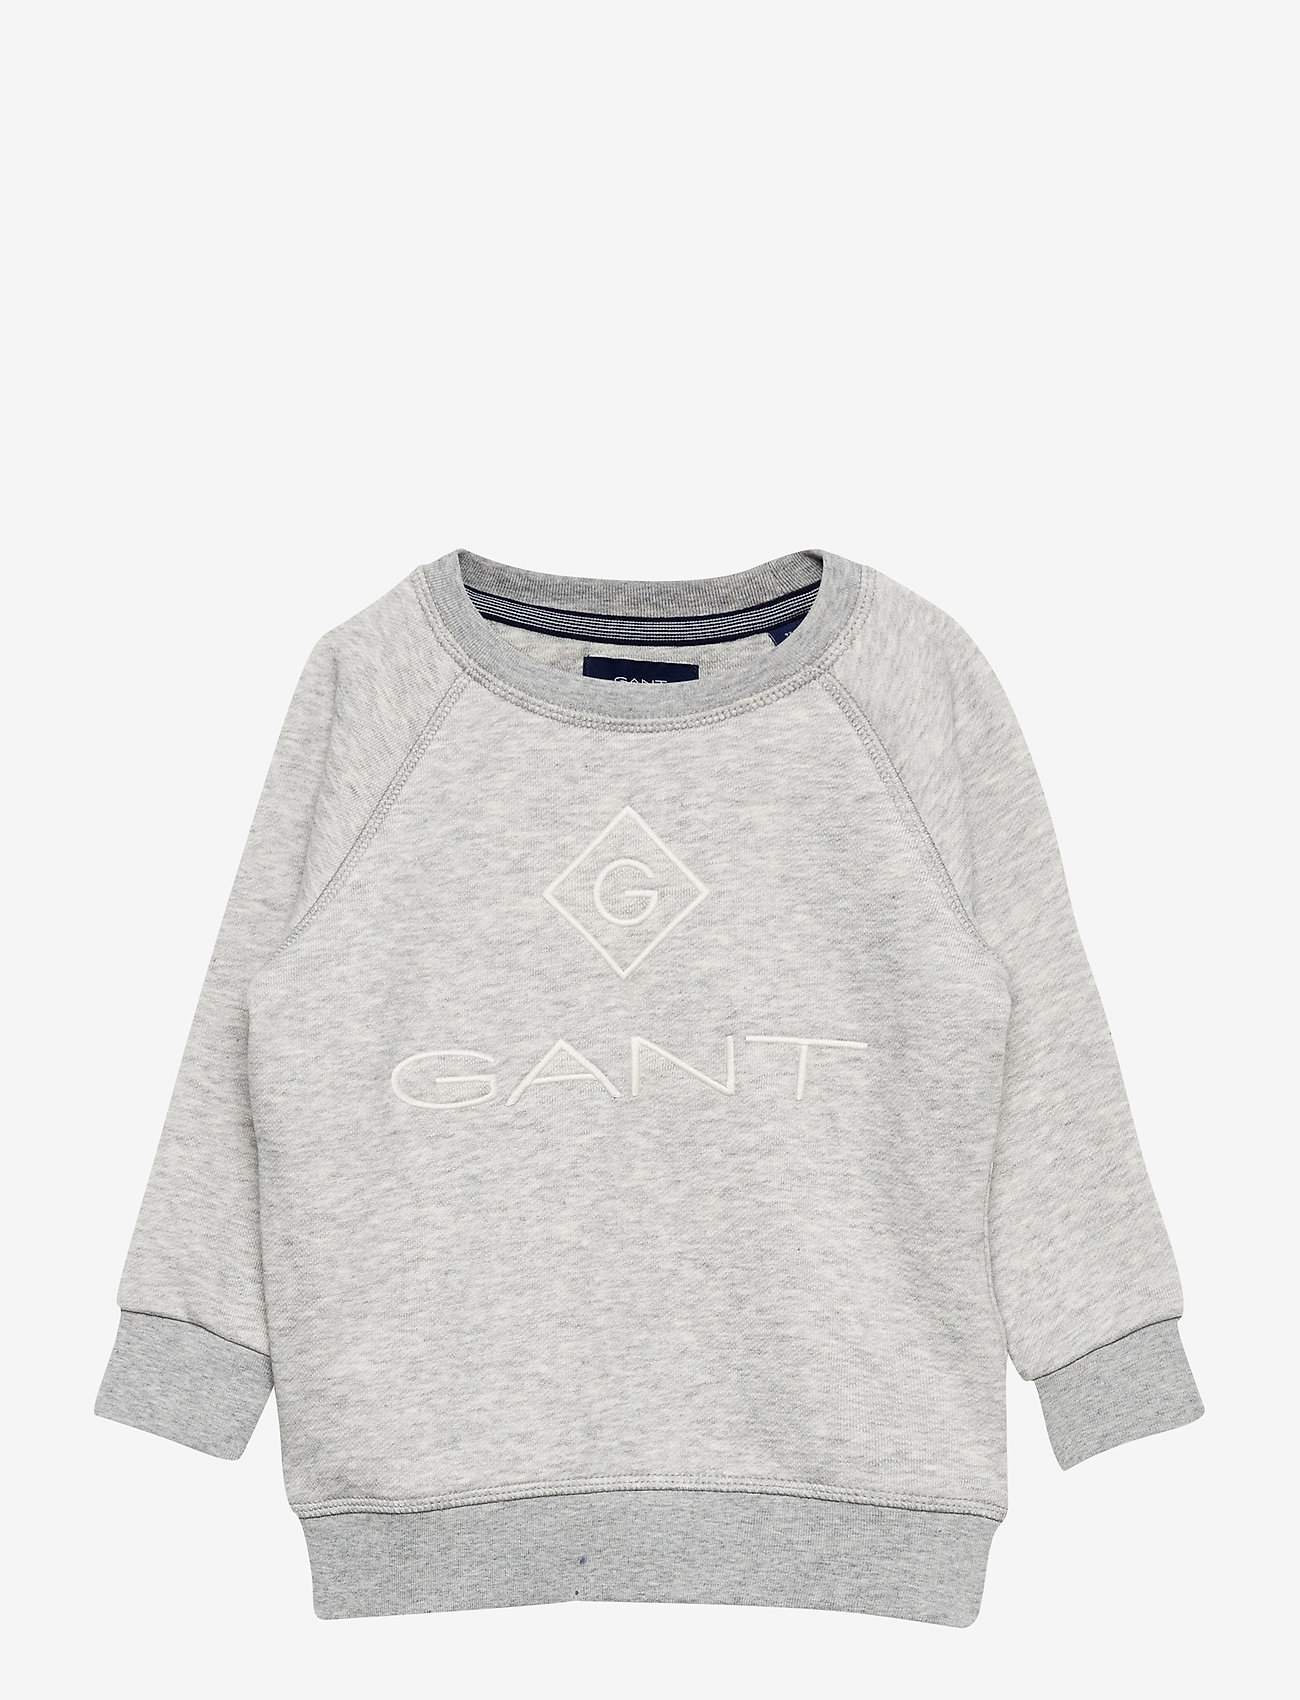 GANT - GANT LOCK-UP SWEAT C-NECK - sweatshirts - light grey melange - 0